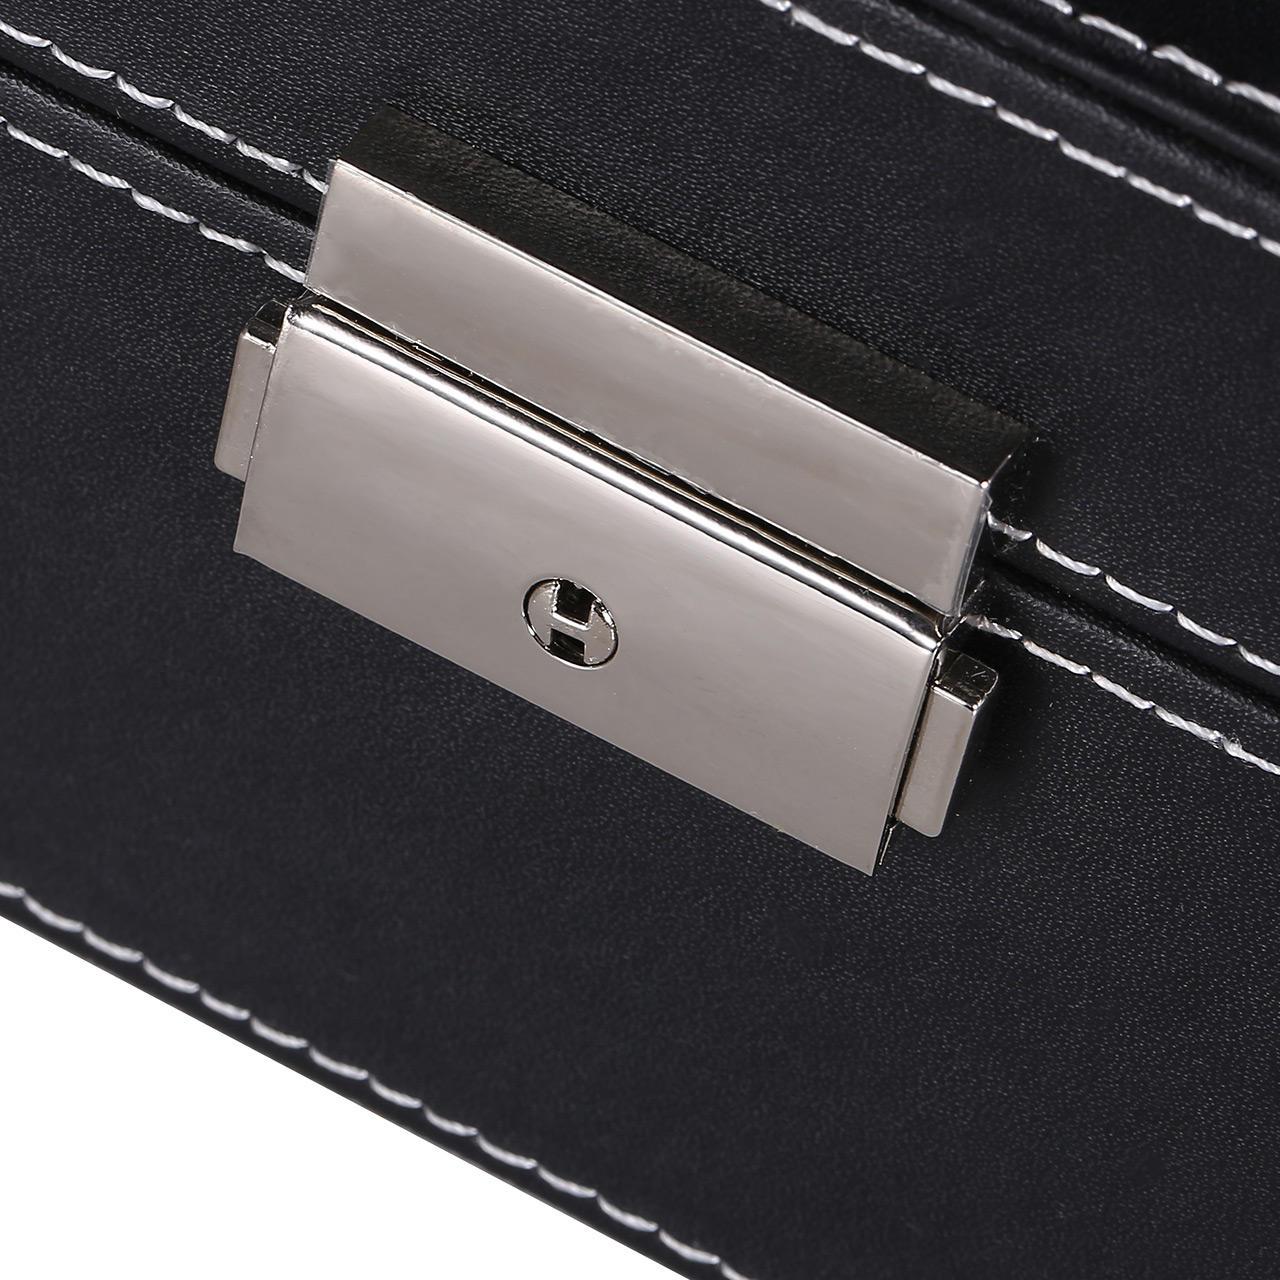 Jewelry Box Watch box Leather Organizer Storage Case with Lock Mirror ,Black -SortWise™ - image 4 de 5